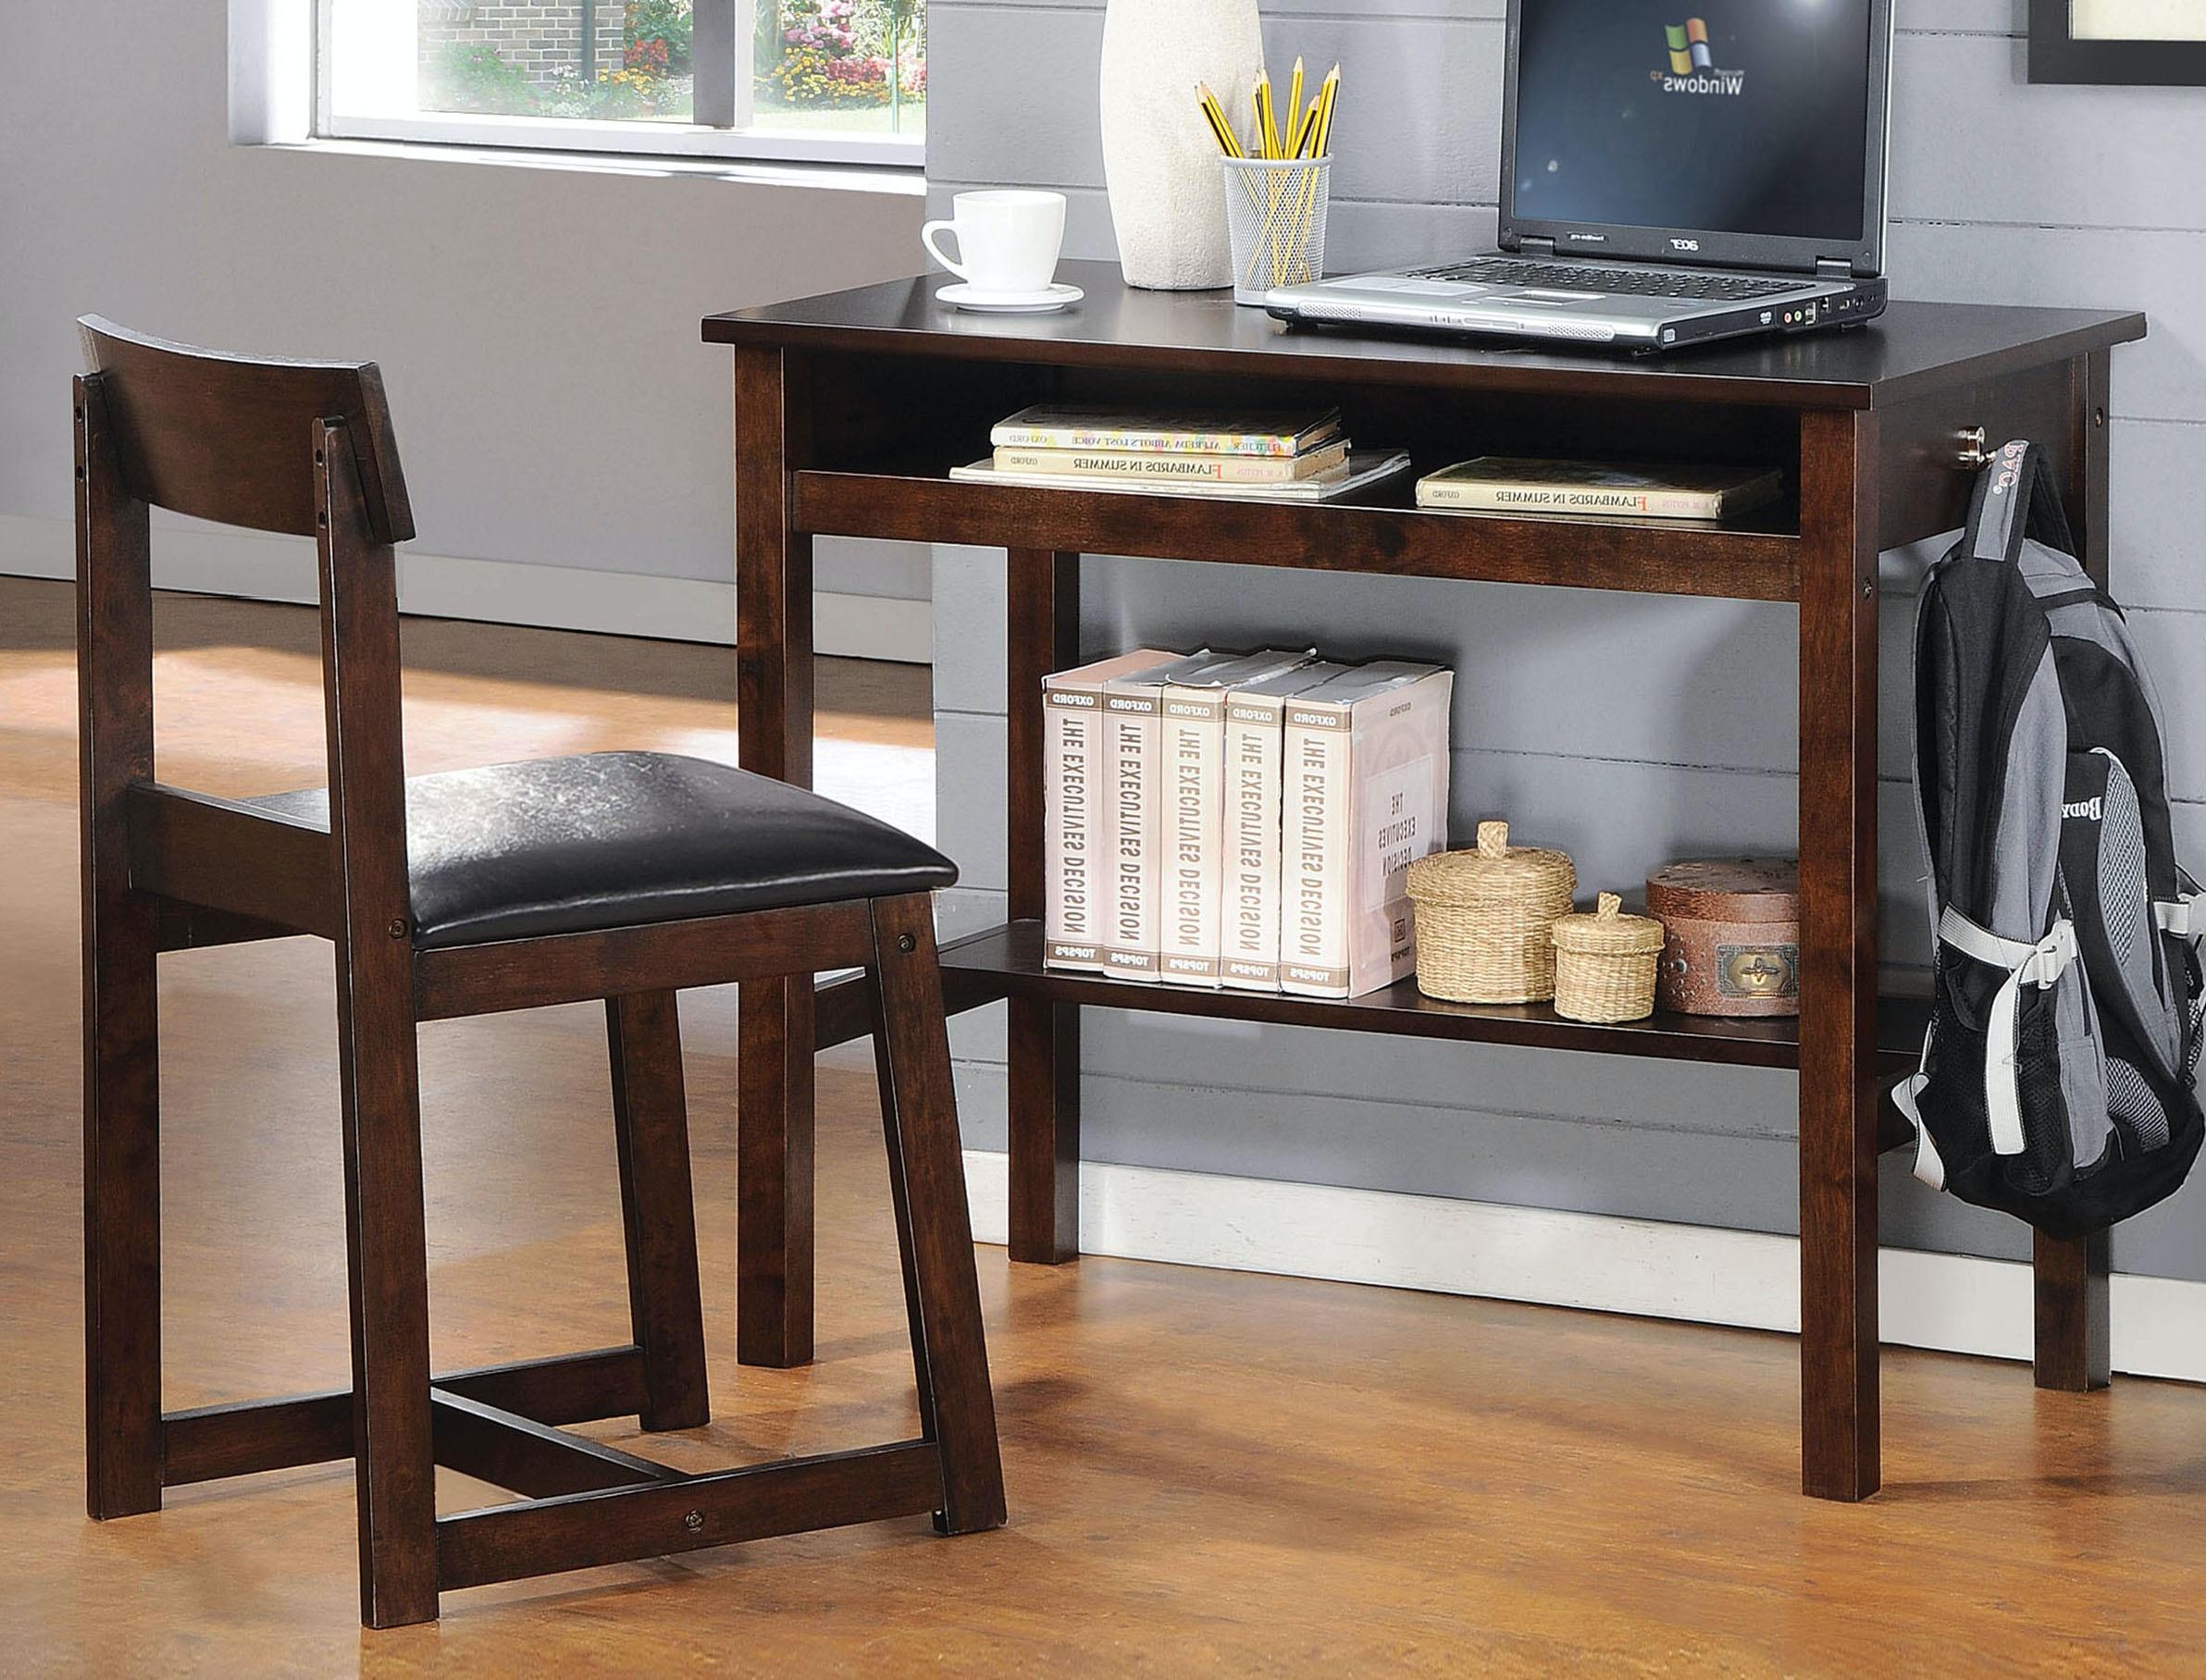 Acme Furniture Home Office Vester 2 Piece Desk U0026 Chair 92044 At Hi Desert  Furniture